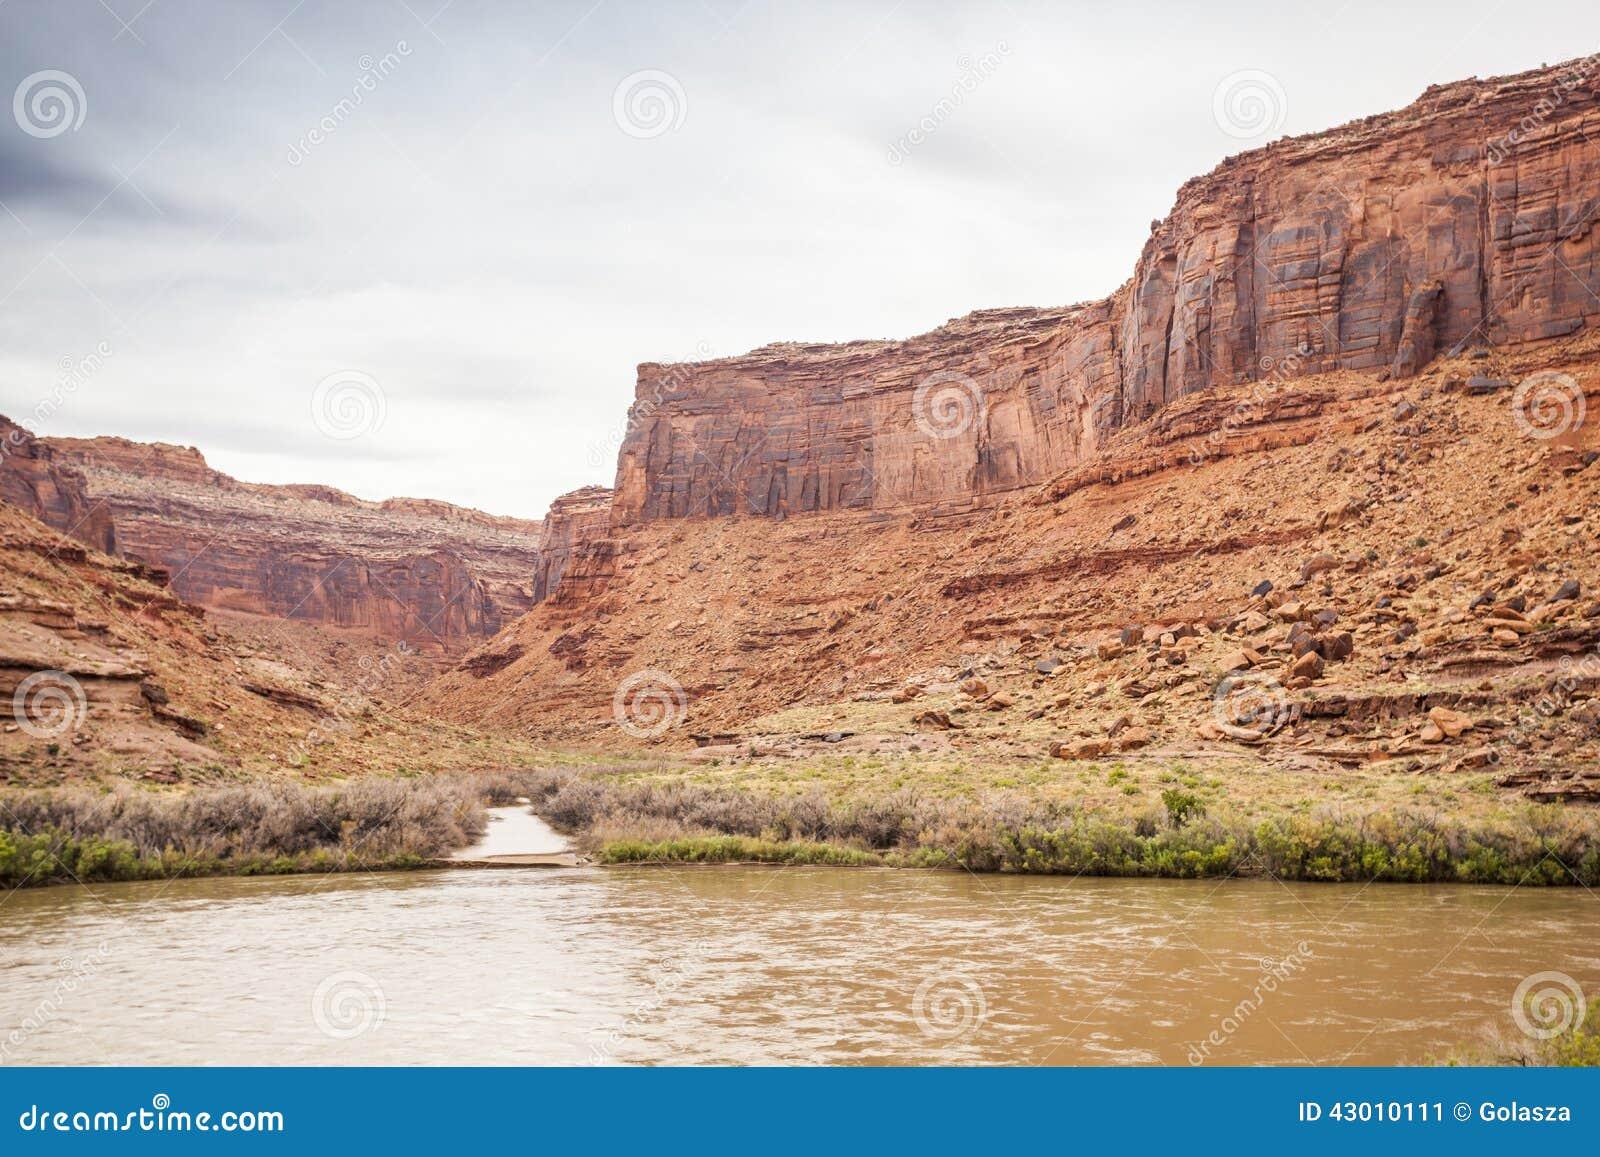 Landscape of utah colorado river and red rocks stock for Landscaping rocks tooele utah